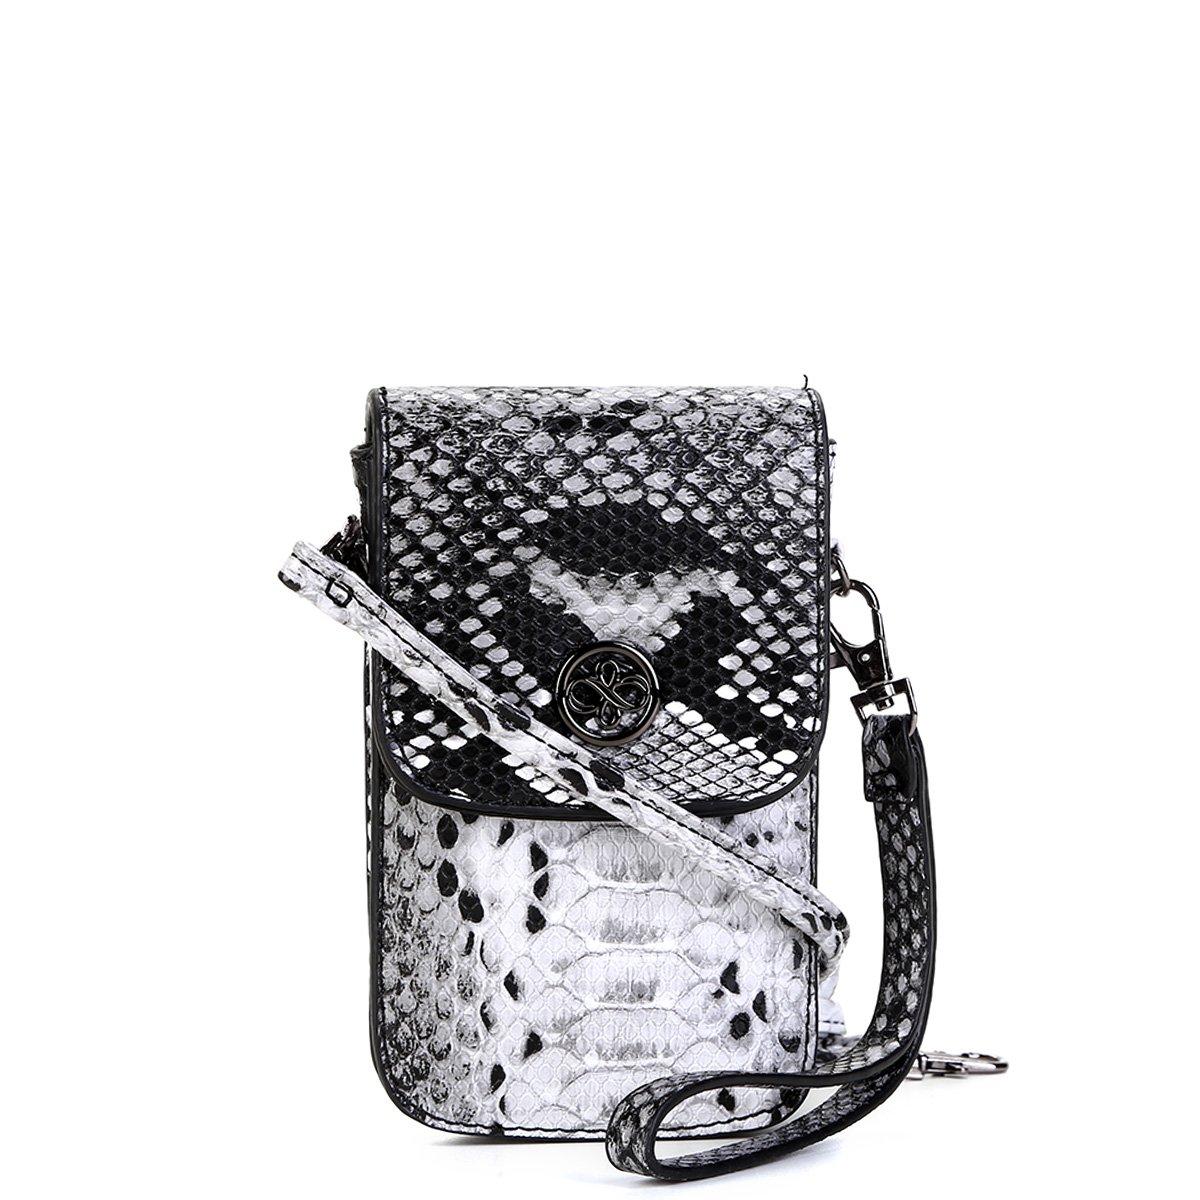 e7fe92ff3 Bolsa Shoestock porta Celular Transversal Snake Feminina | Shoestock